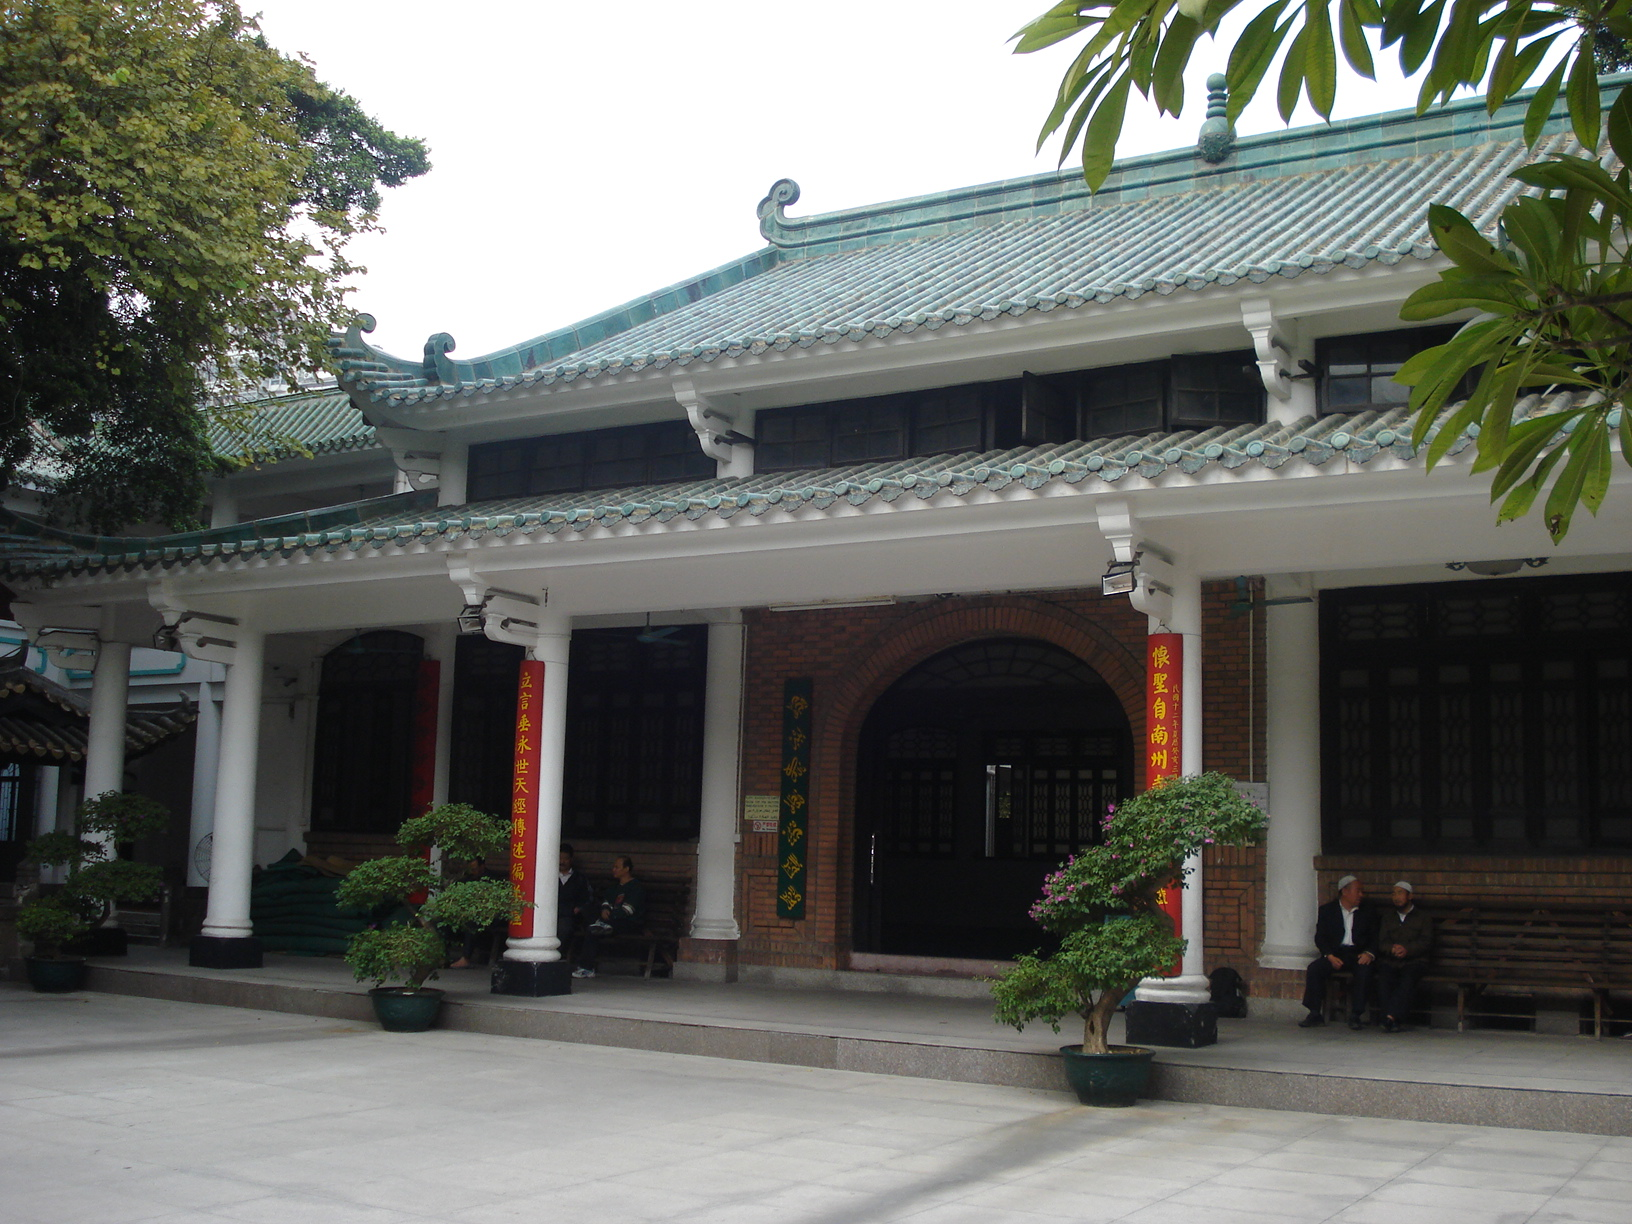 مسجد هوايشينغ